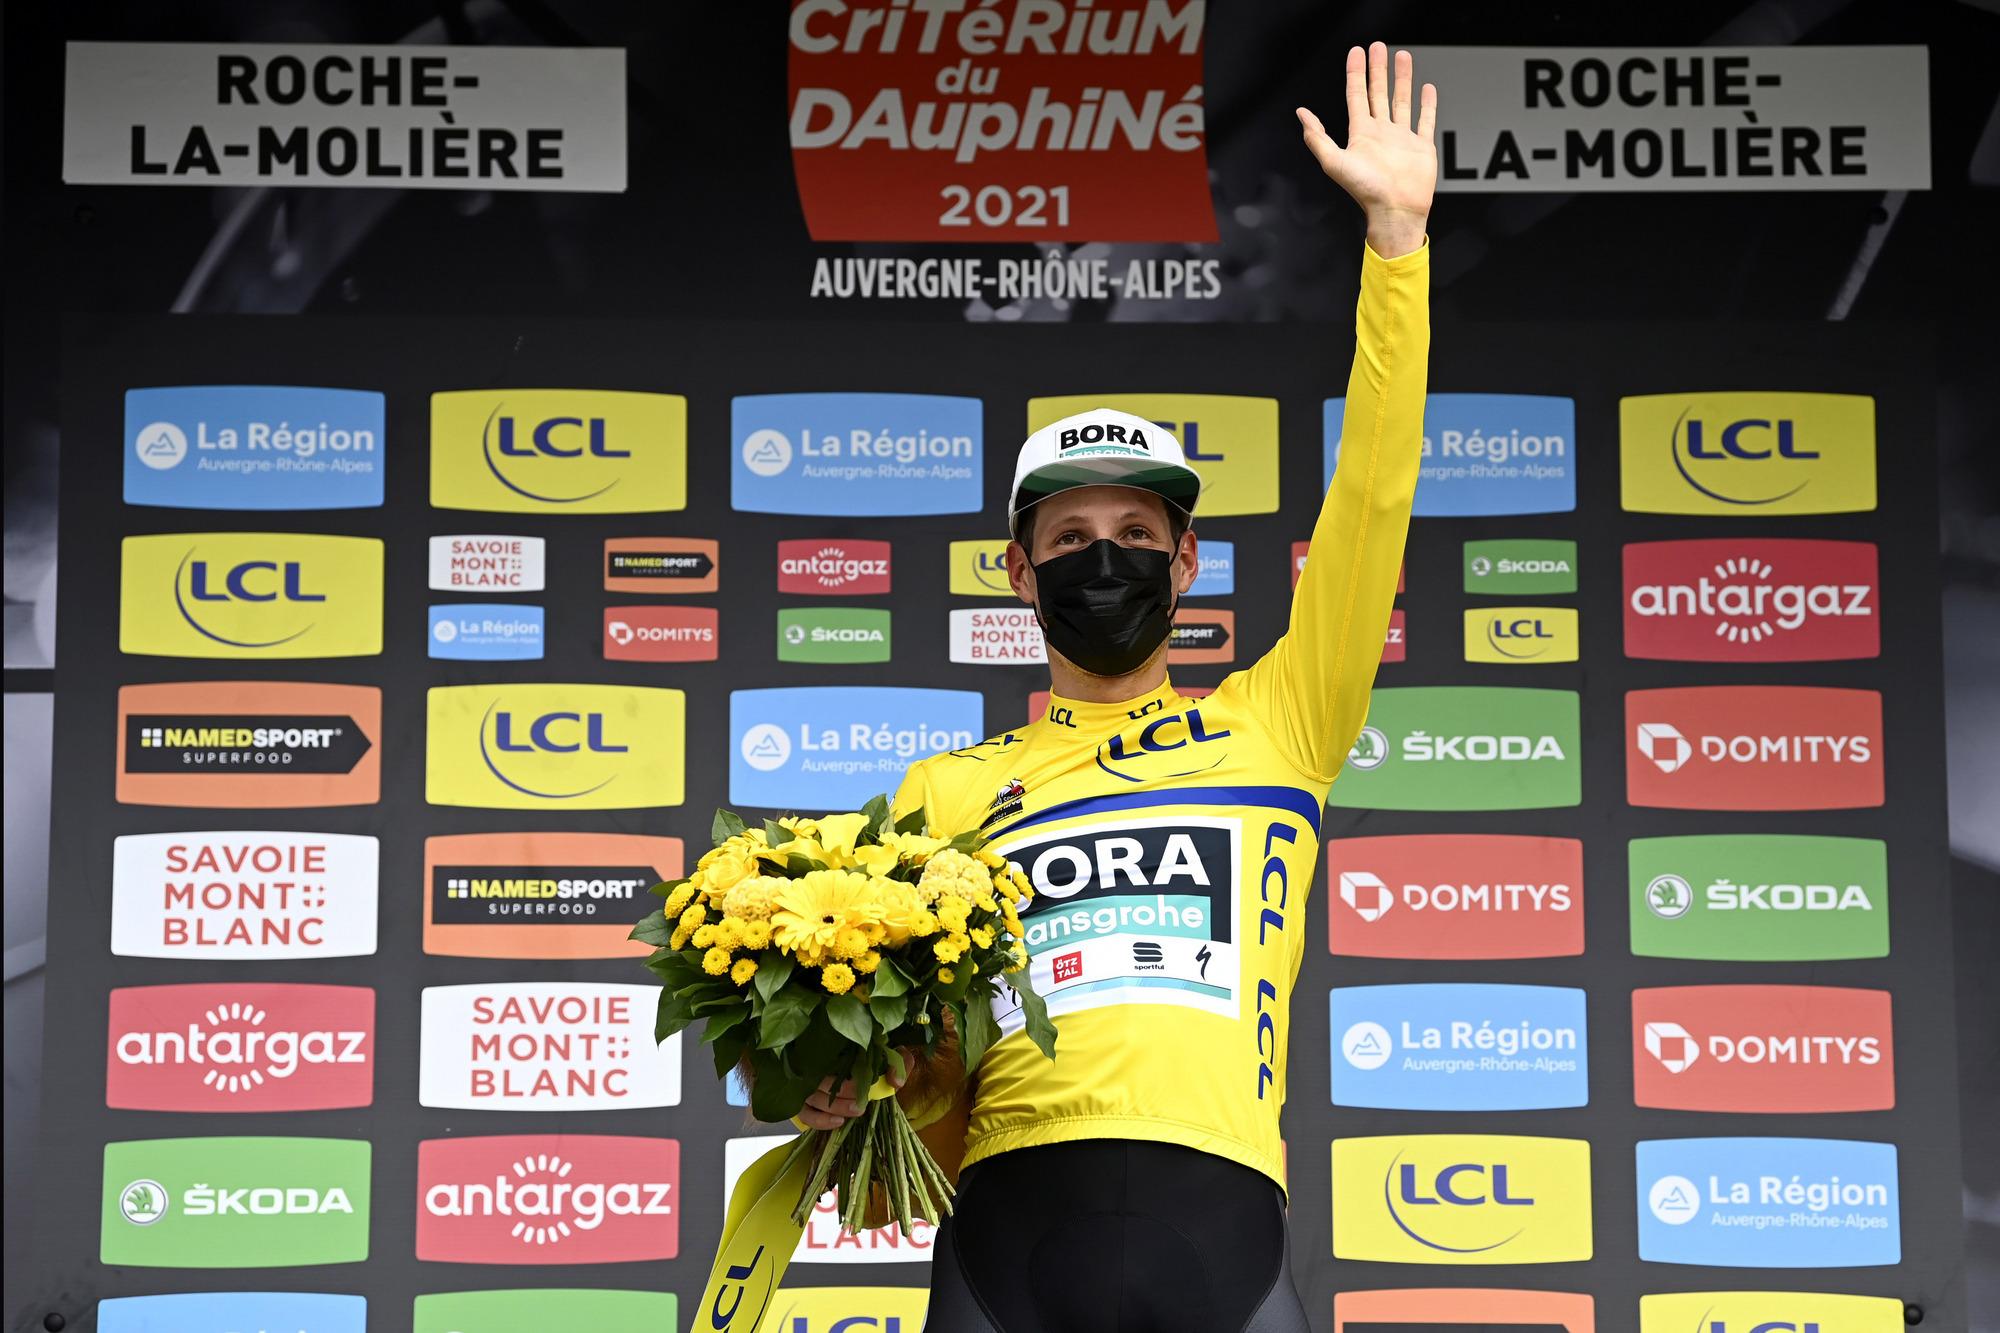 Criterium du Dauphine 2021 - 73rd Edition - 4th stage Firminy - Roche La Moliere 16,4 km - 02/06/2021 - Lukas Postlberger (AUT - Bora - Hansgrohe) - photo Nico Vereecken/PN/BettiniPhoto©2021